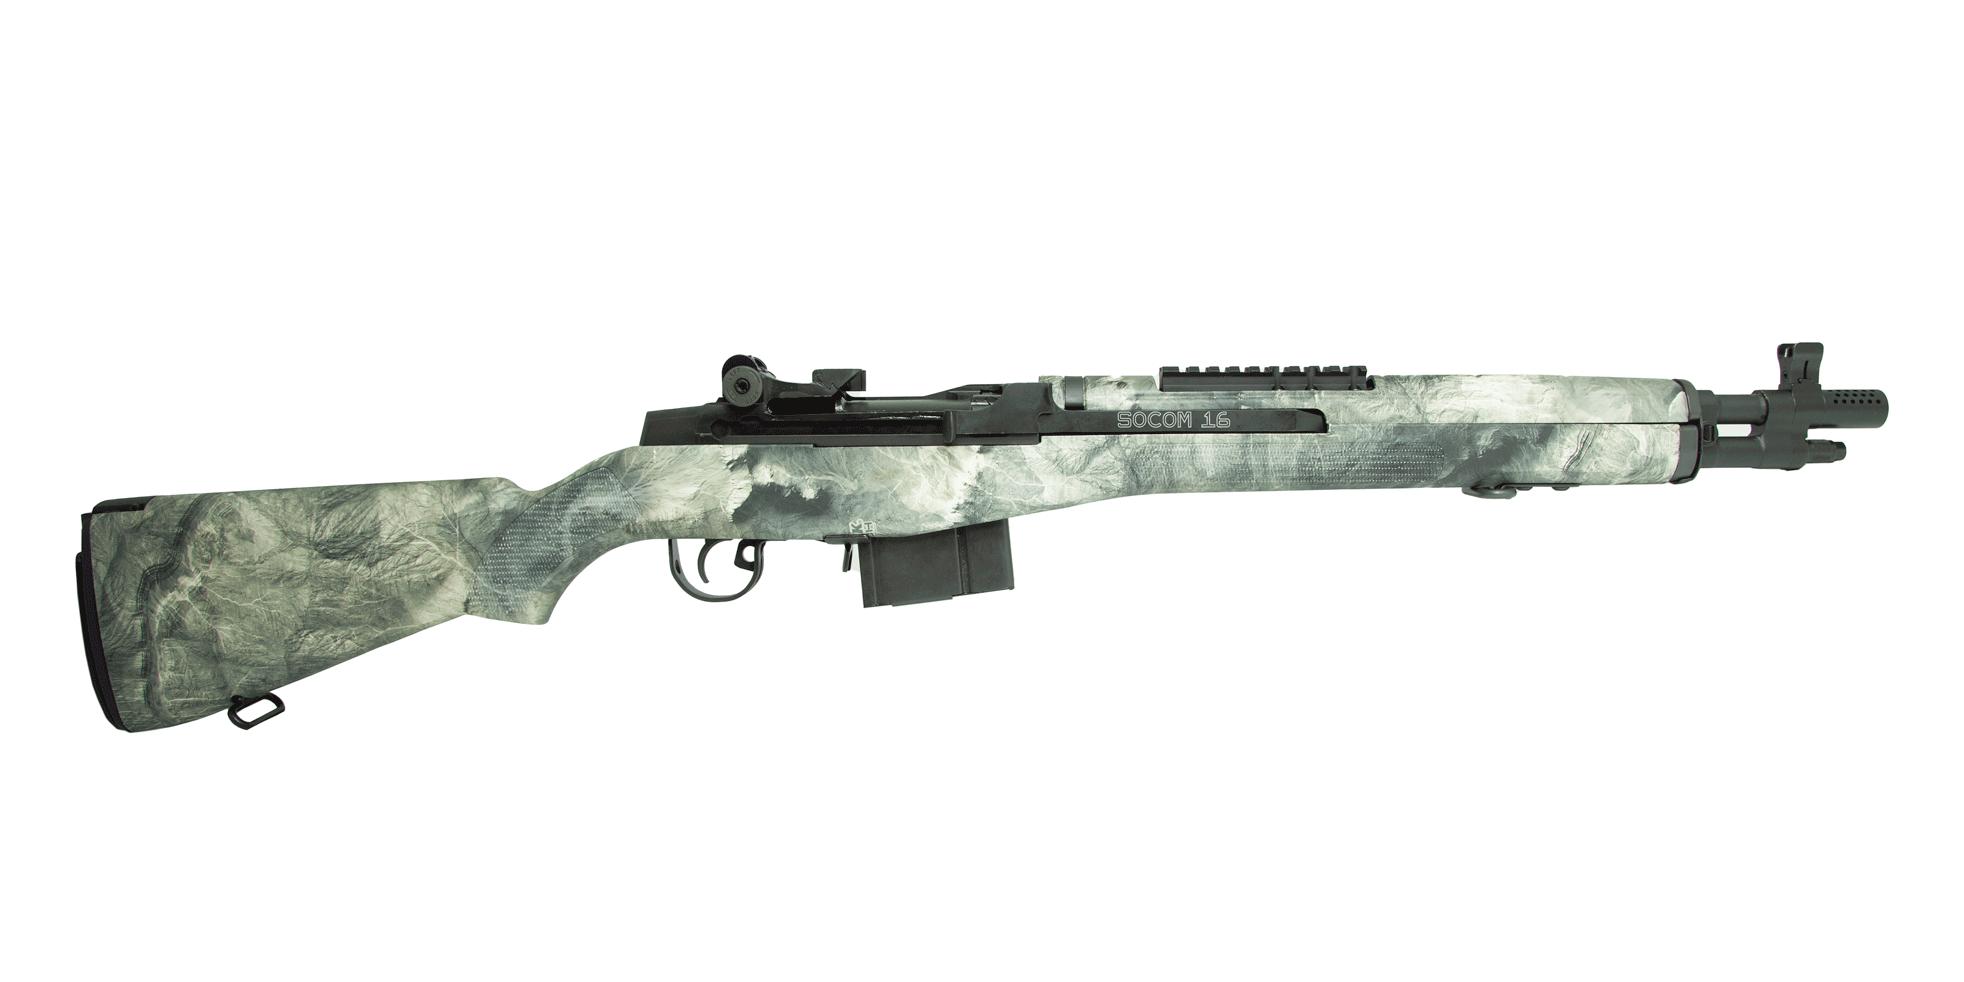 Springfield Armory M1A SOCOM .308 Win NRA Mossy Oak Rifle - AA9604